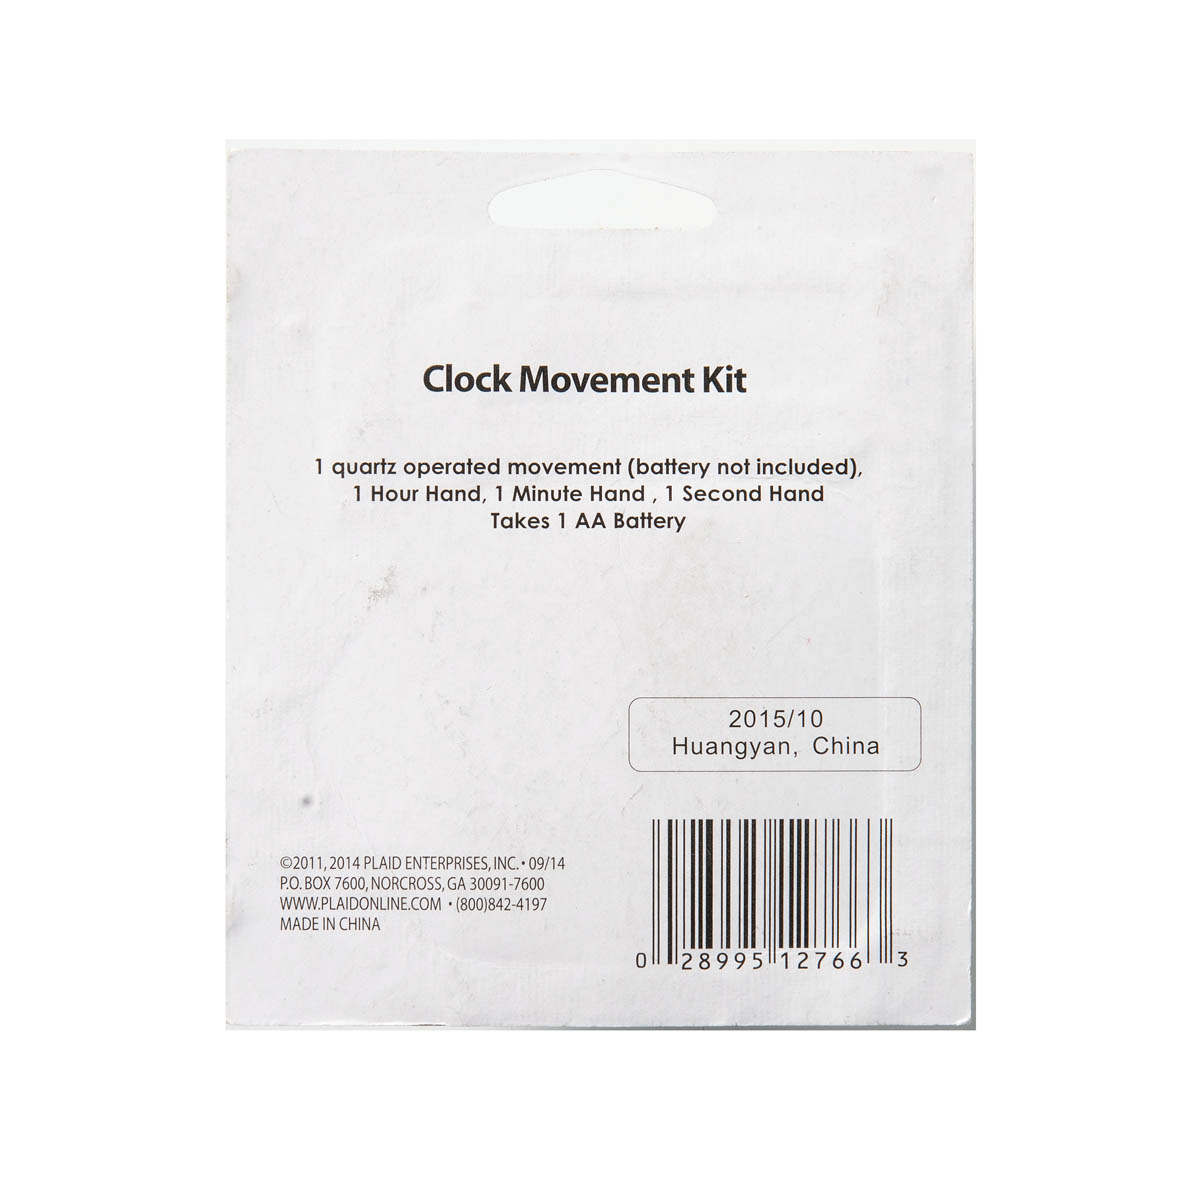 Plaid ® Wood Surfaces - Accessories - Clock Movement Kit, 4 pieces